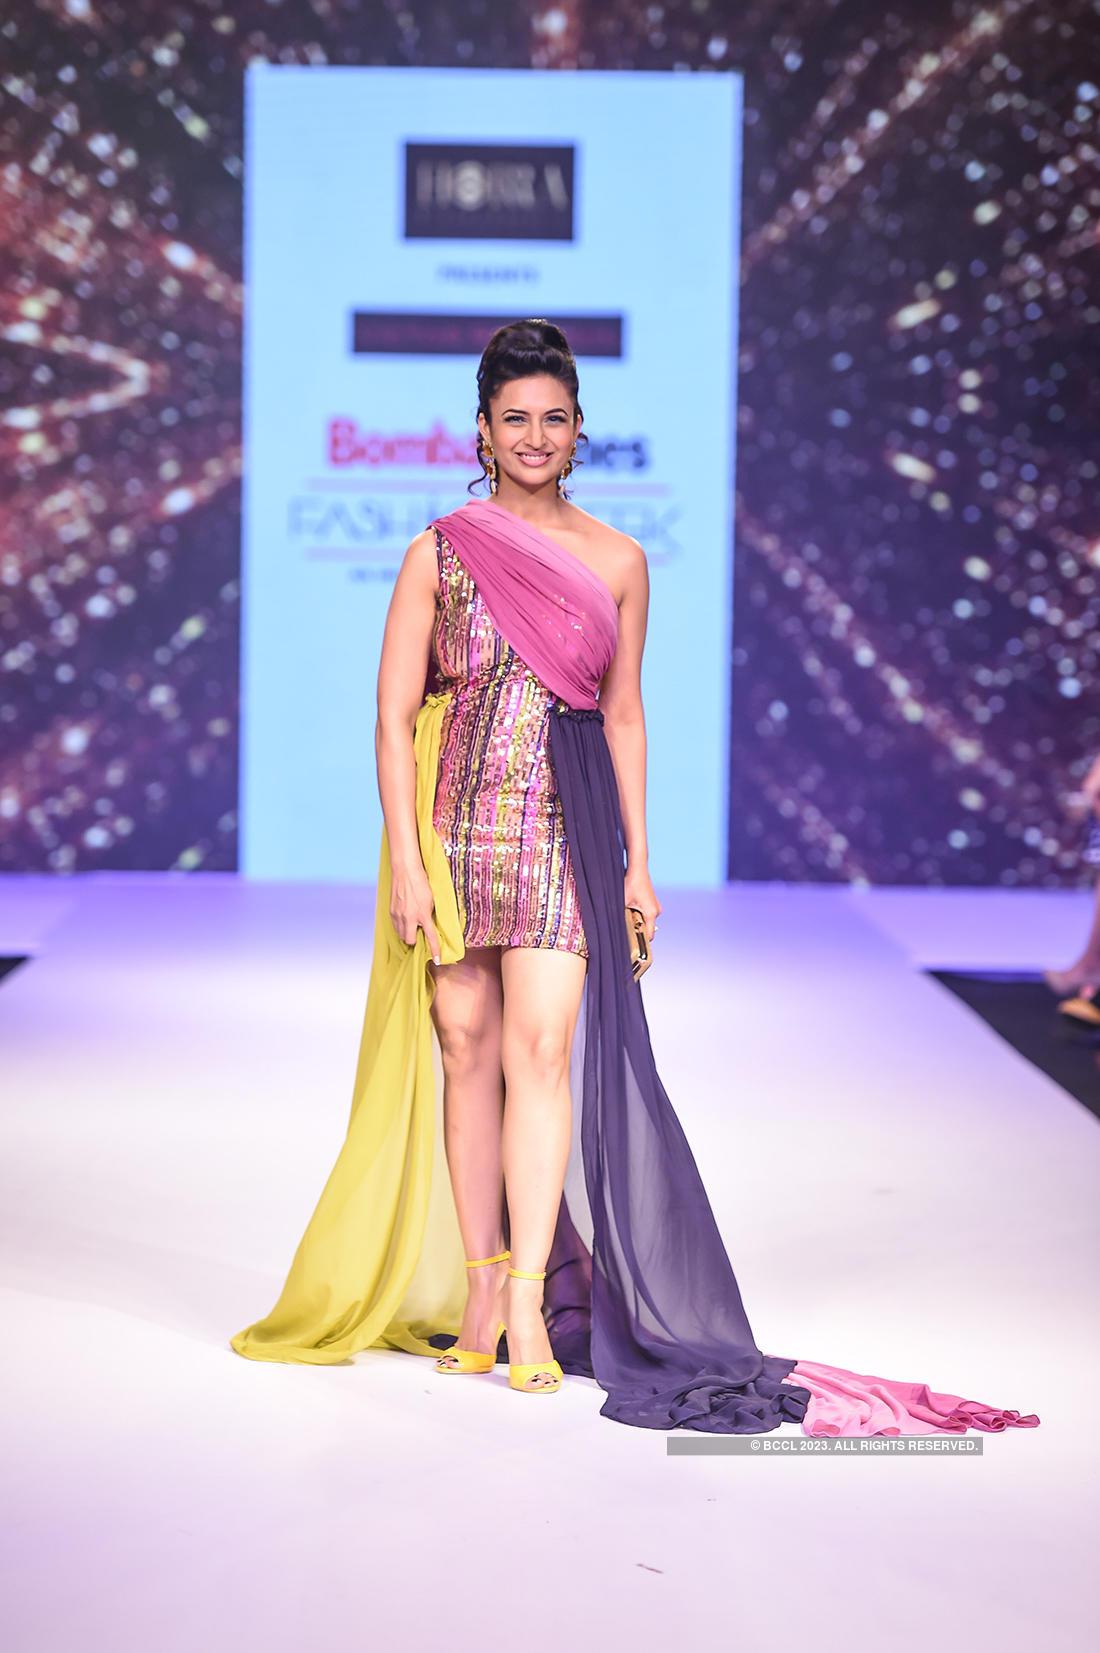 Divyanka Tripathi Dahiya turns showstopper for Victor Robinson at the Bombay Times Fashion Week